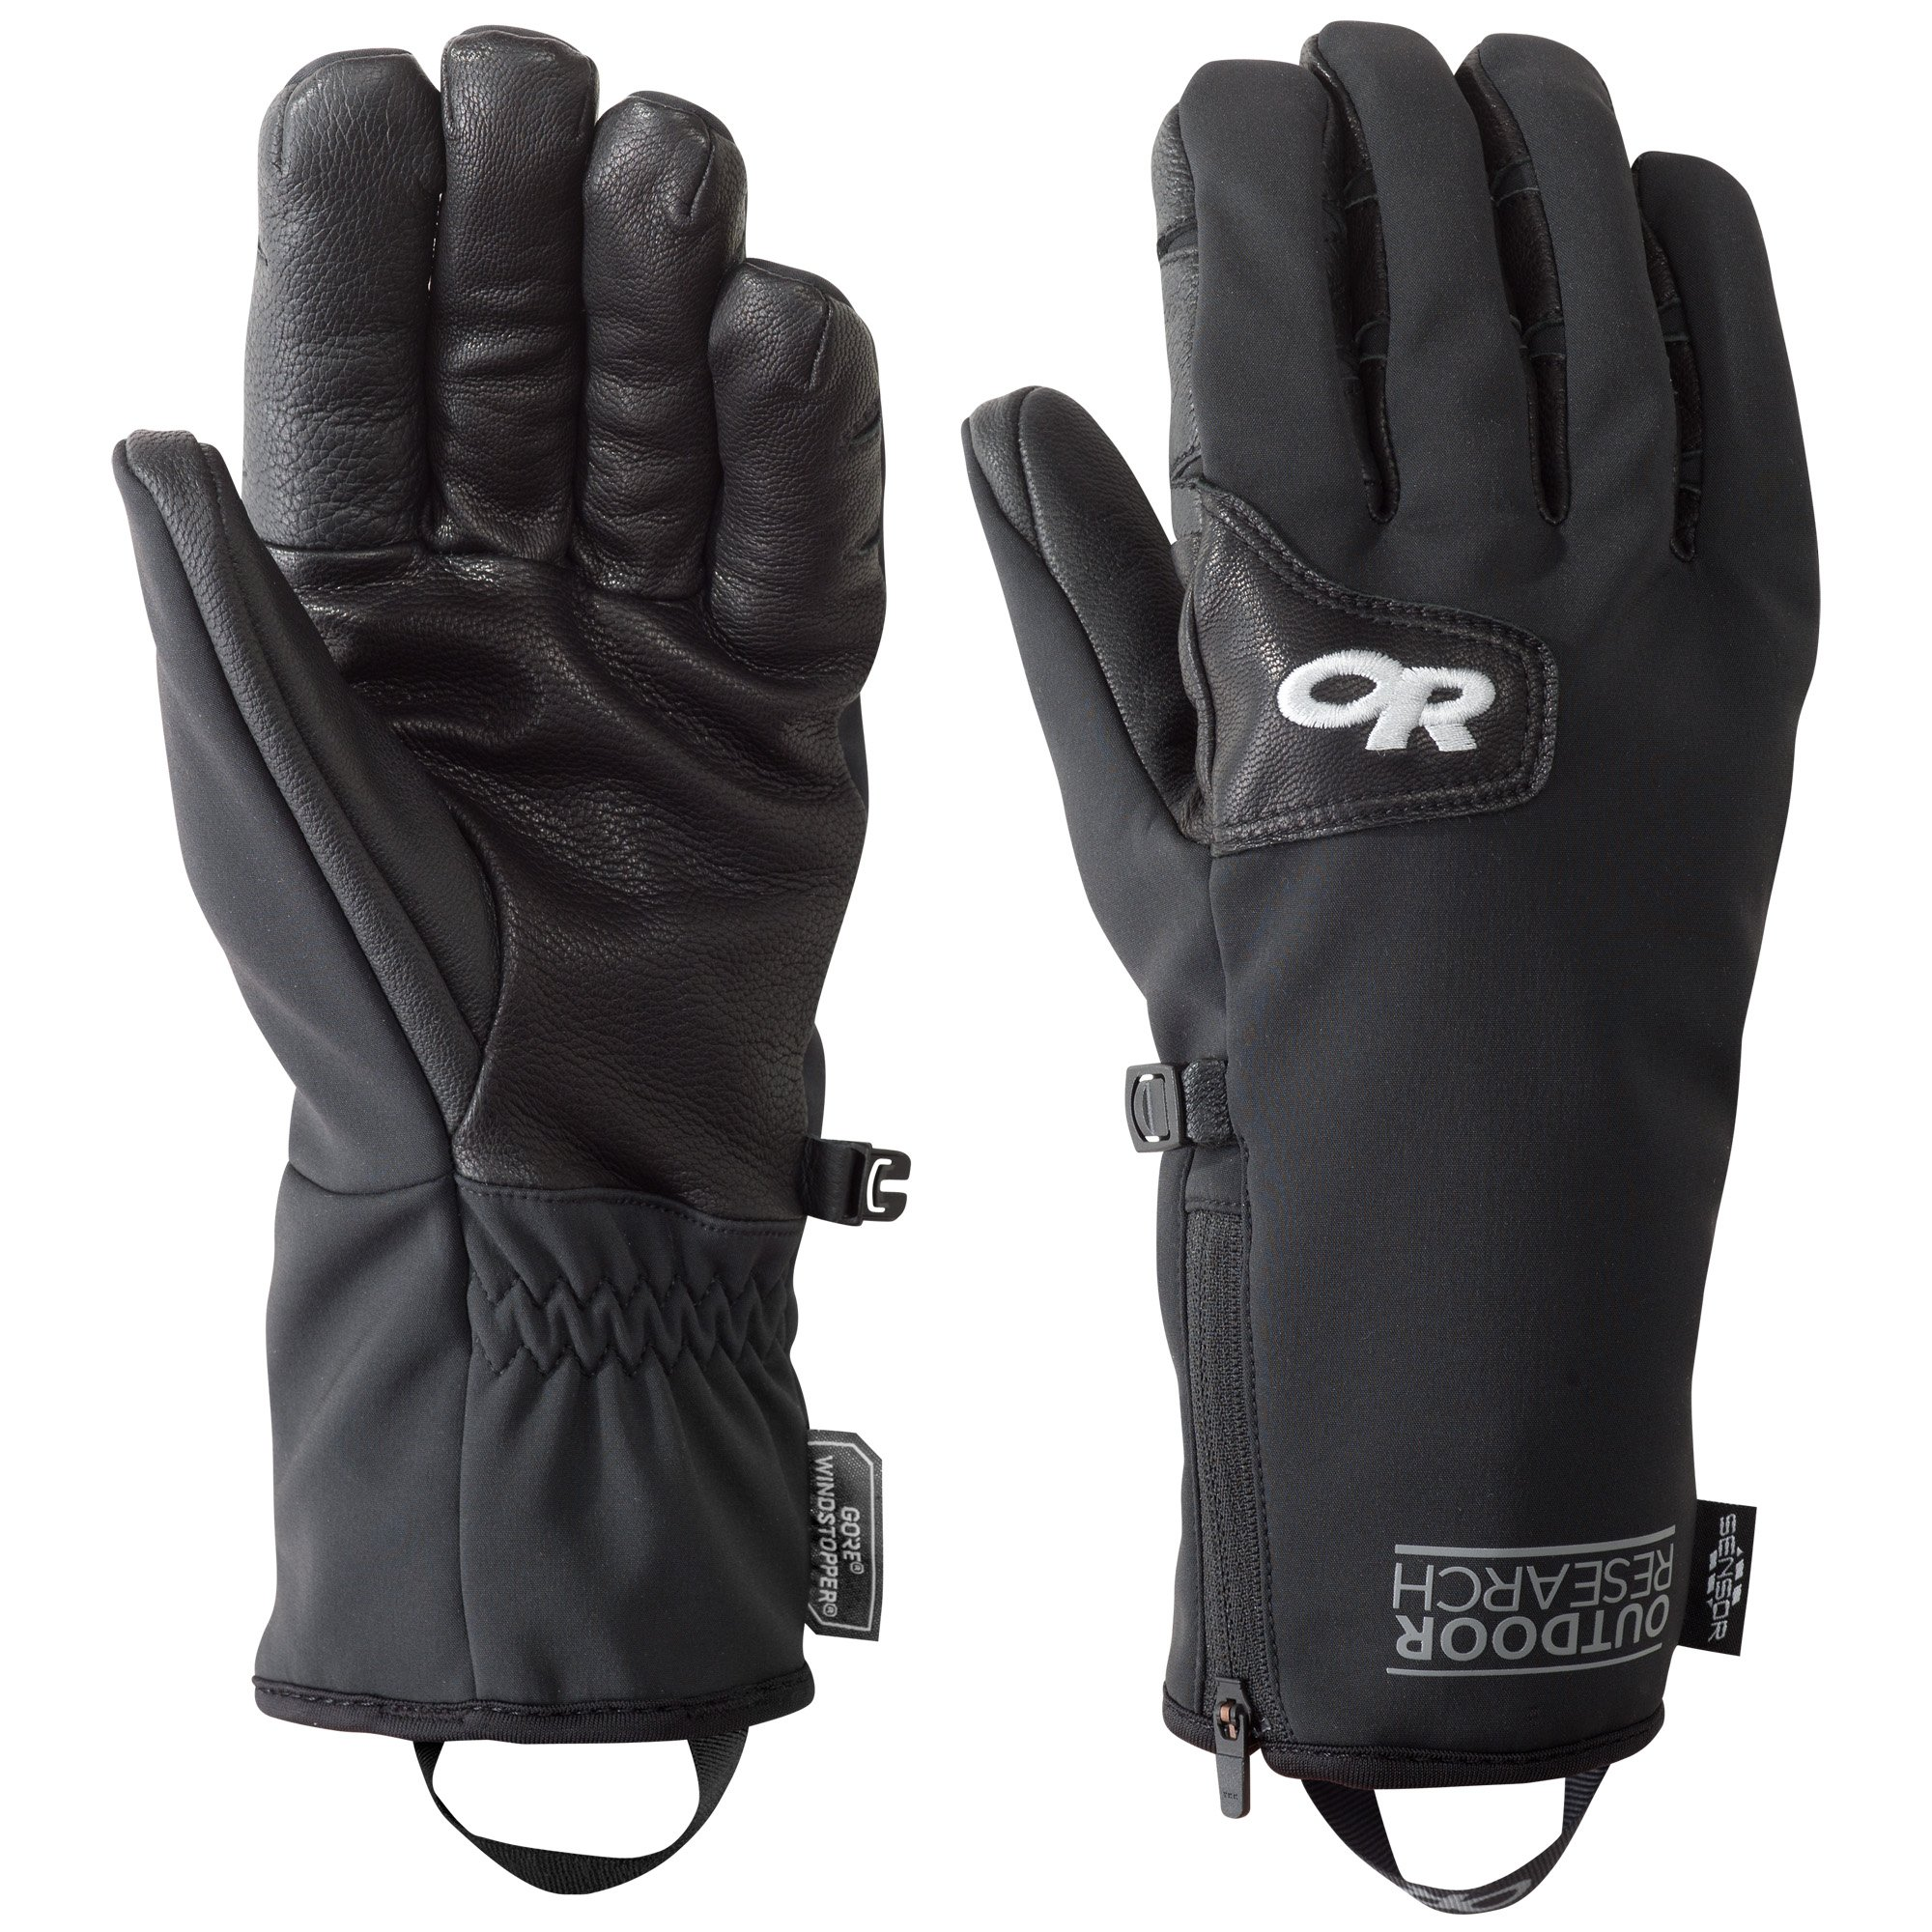 Outdoor Research Men's Stormtracker Sensor Gloves, Black, Large